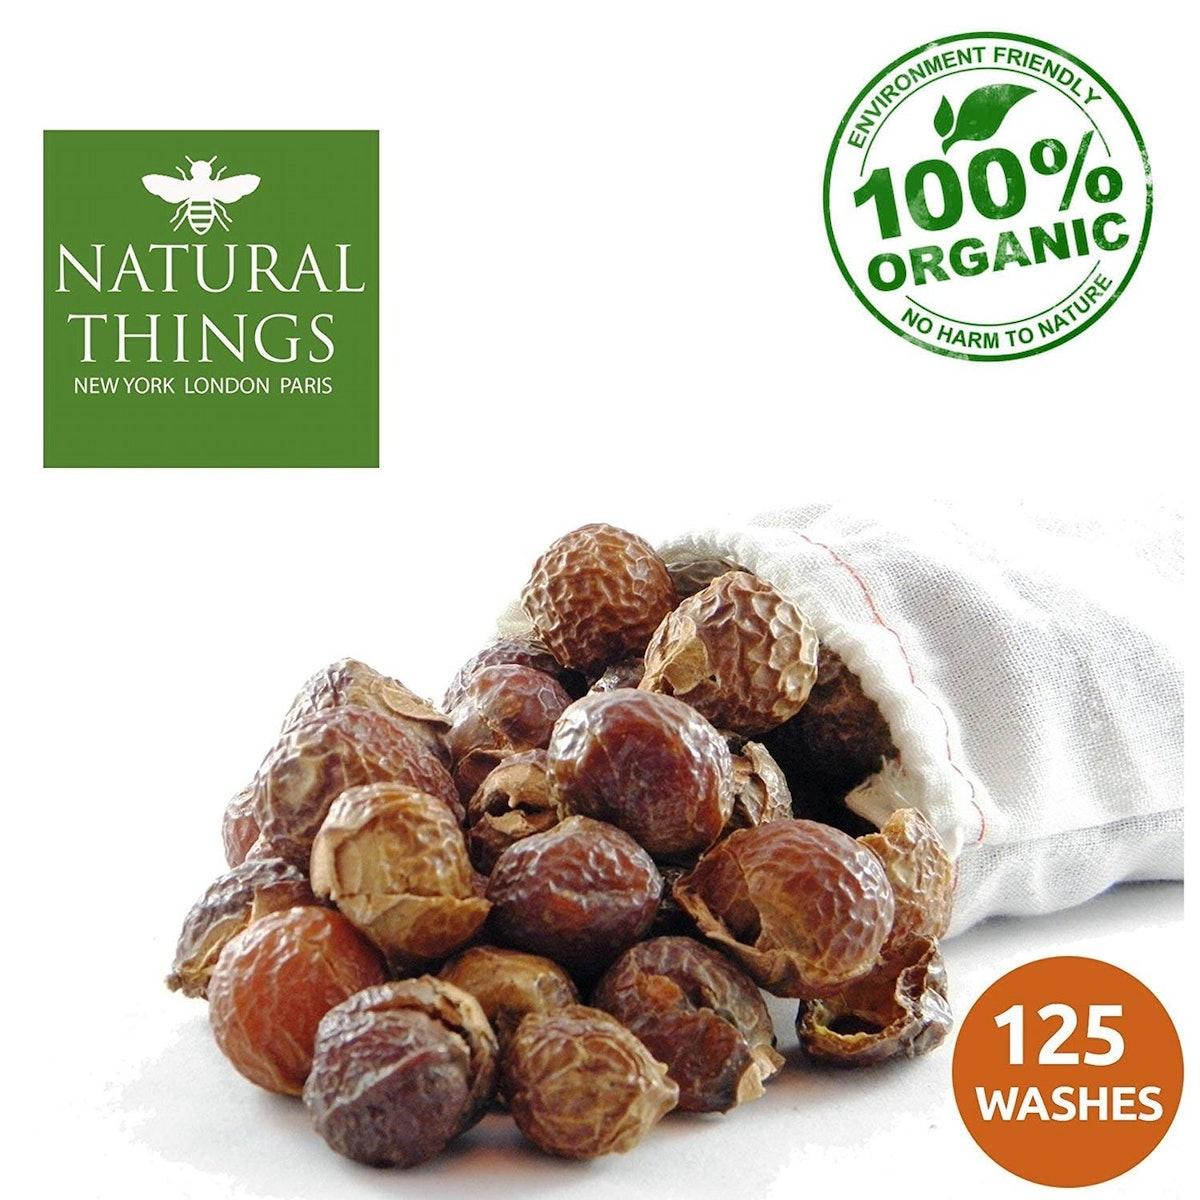 Natural Things Laundry And Dishwashing Nuts